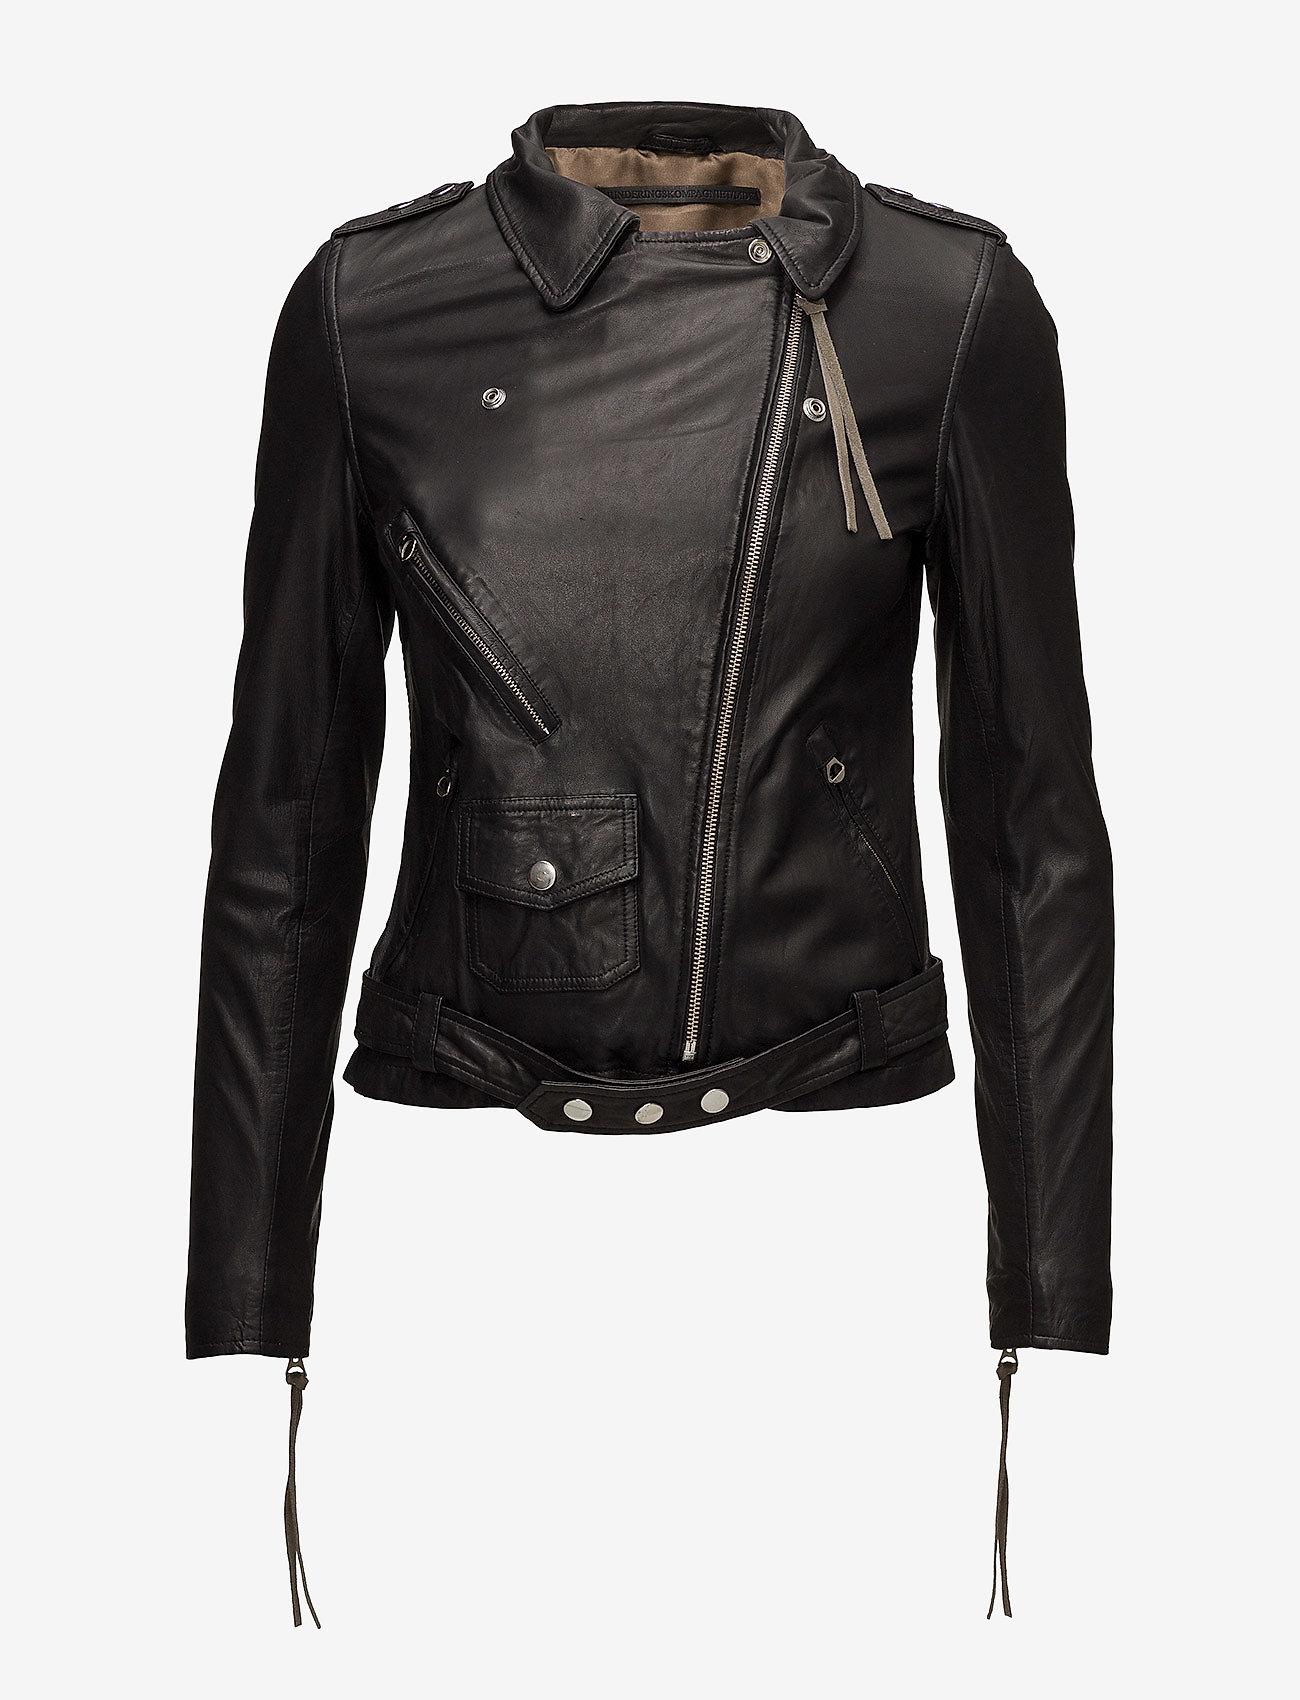 MDK / Munderingskompagniet - London thin leather jacket - skinnjakker - black - 1